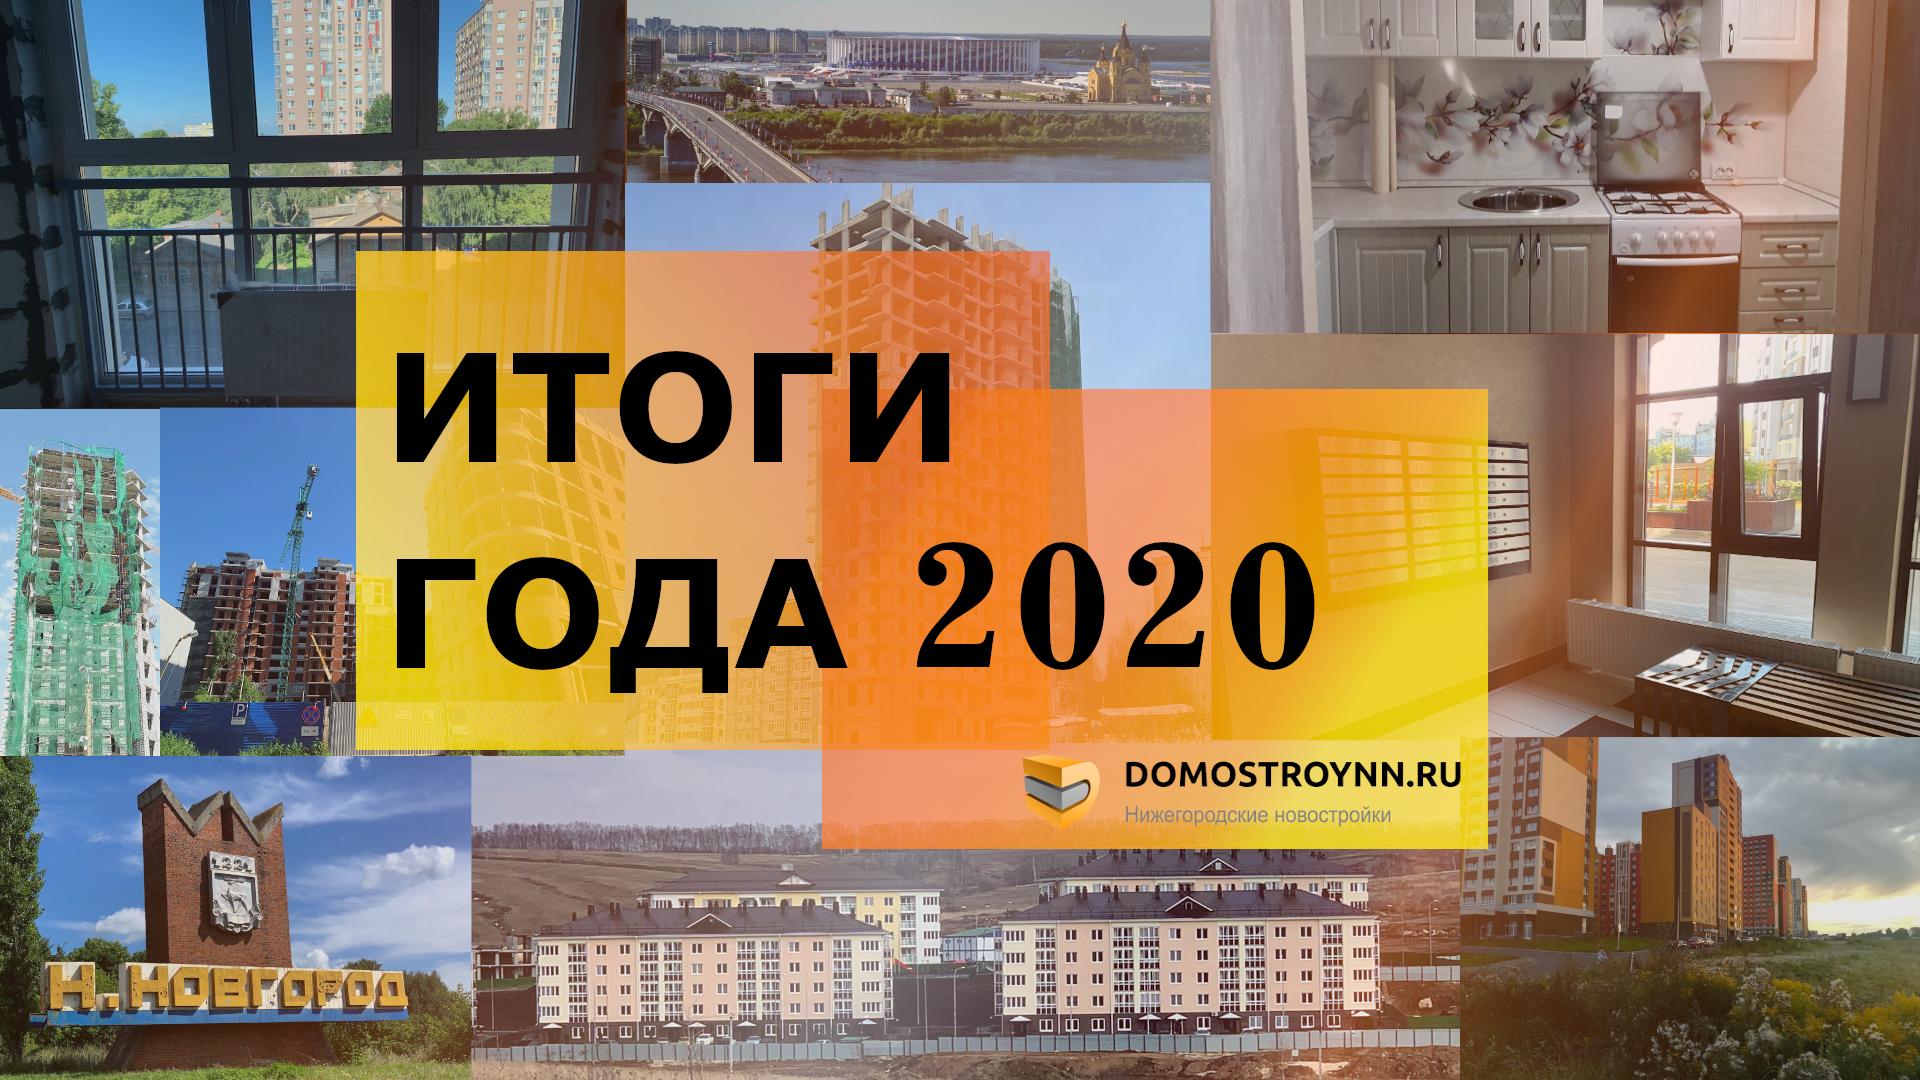 Итоги года 2020 - фото 1